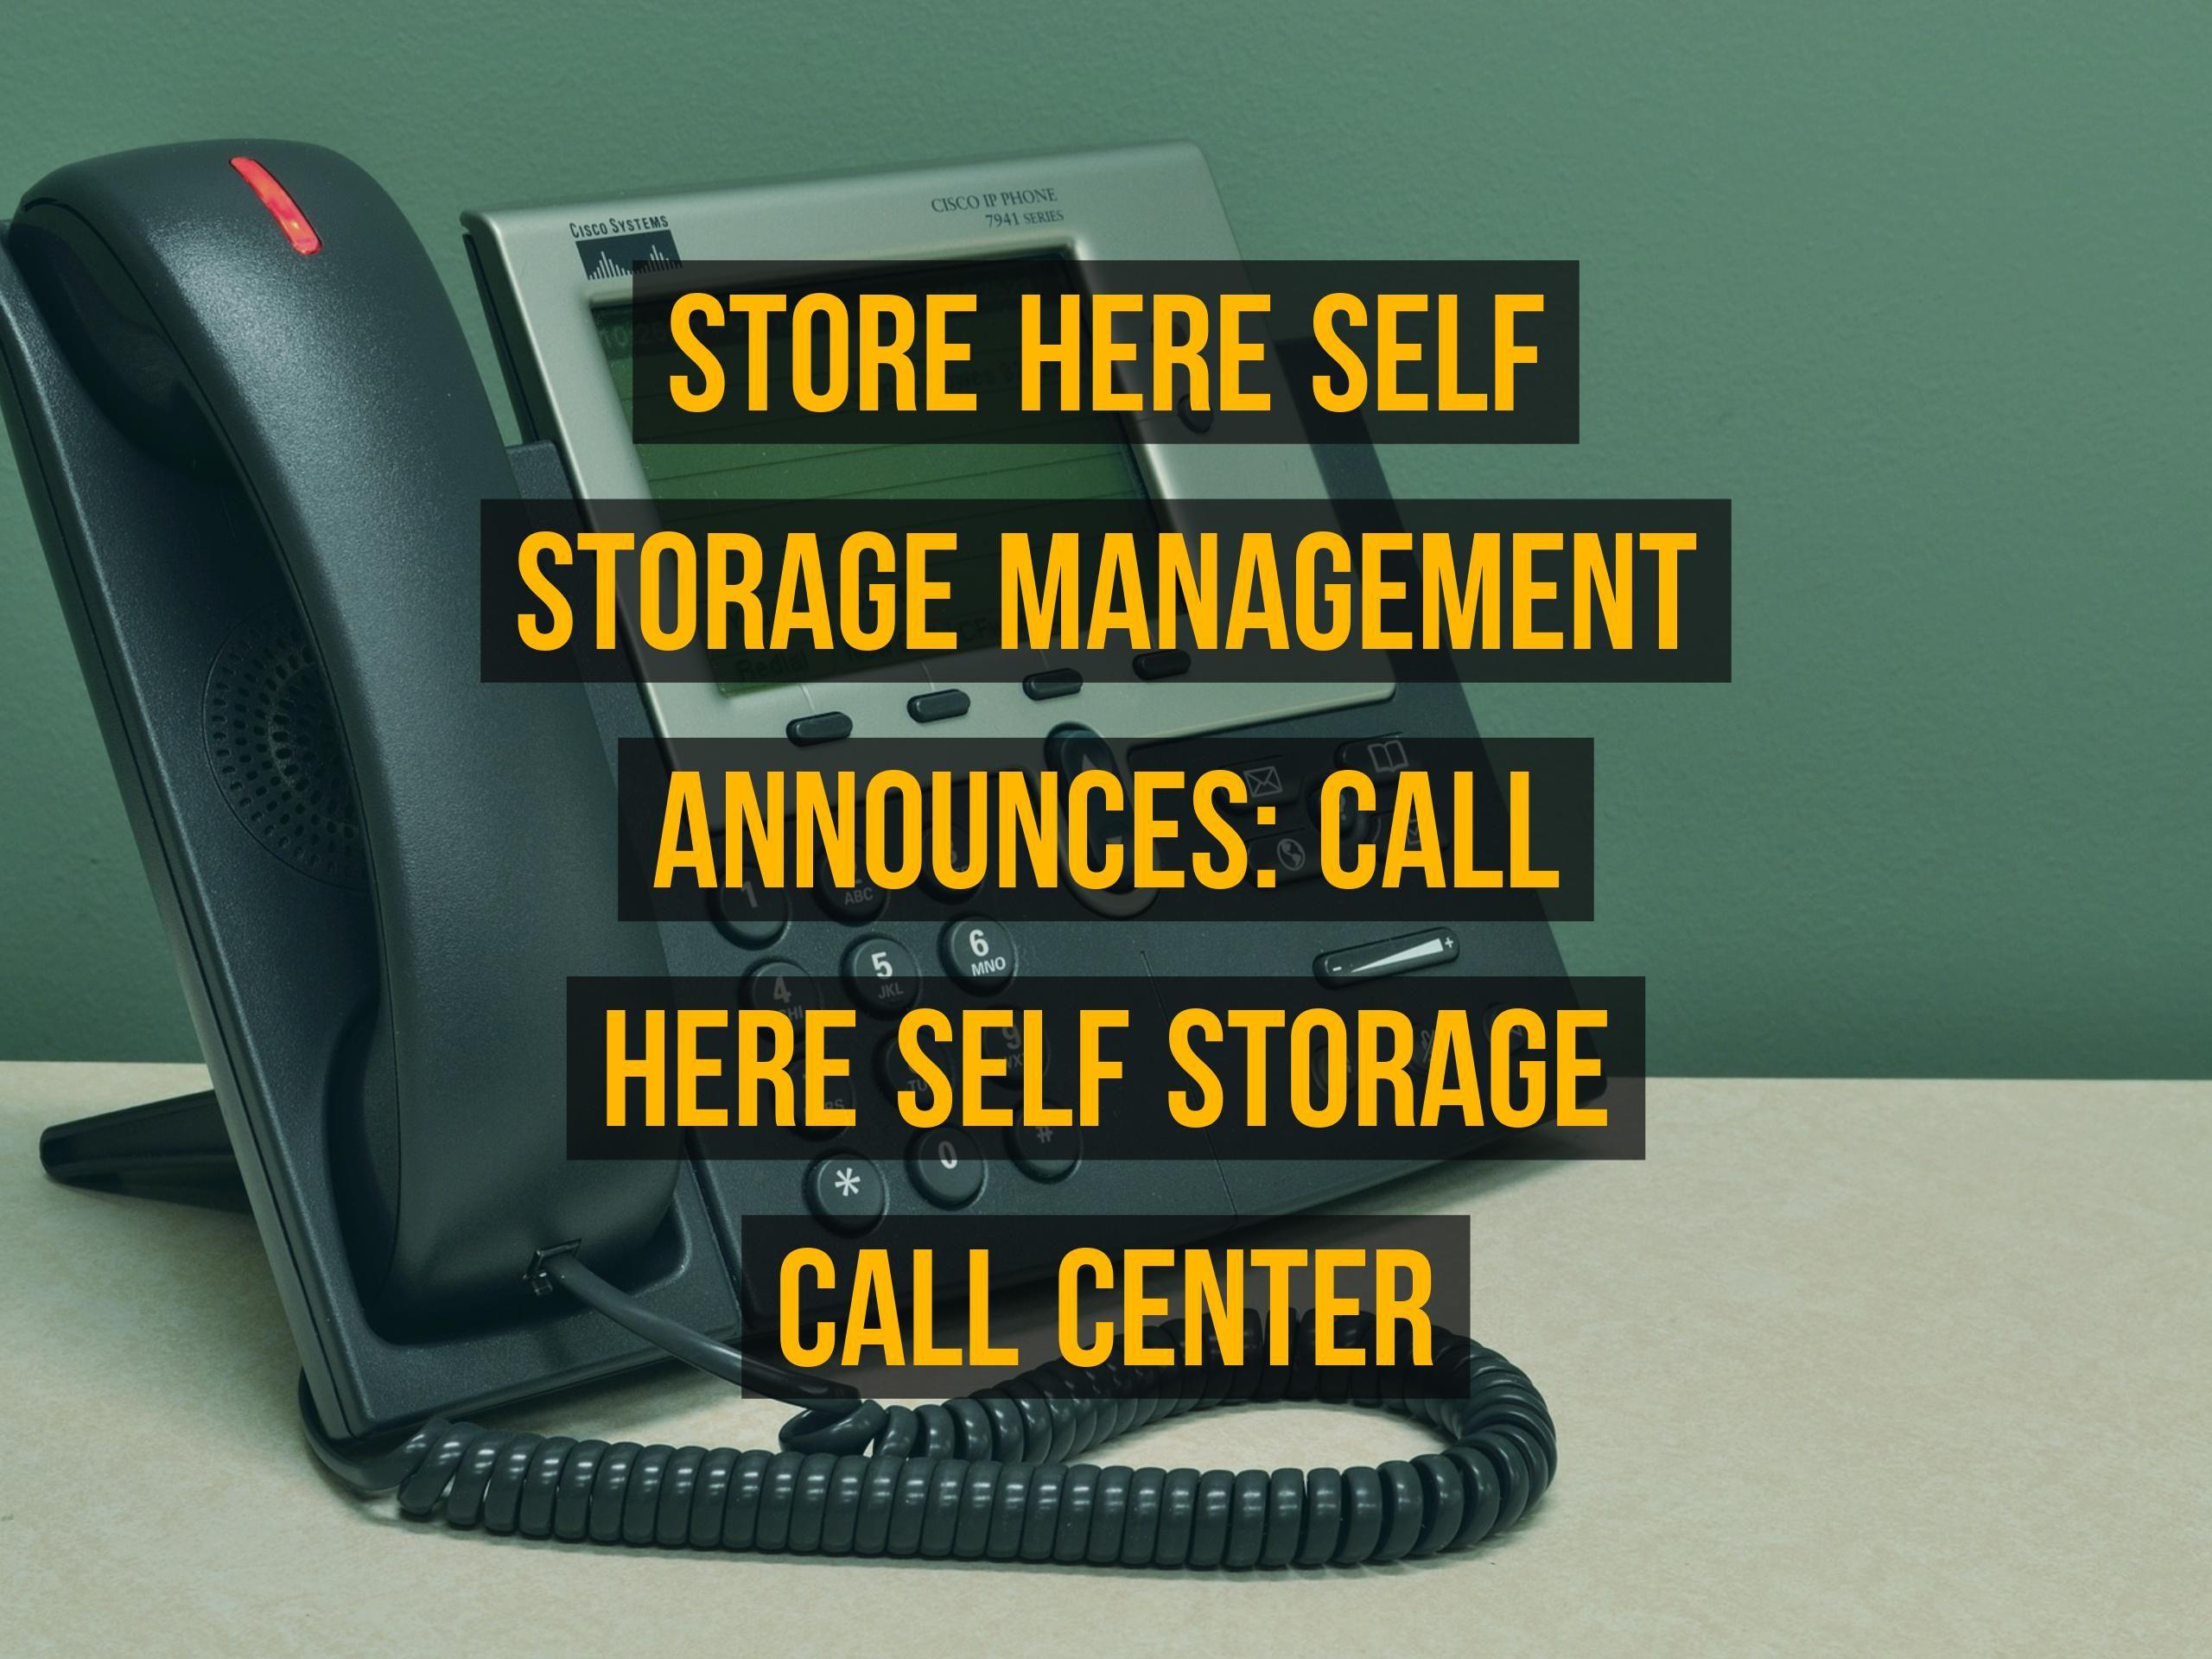 Http Goo Gl Dd4xiy Here Self Storage Management Announces